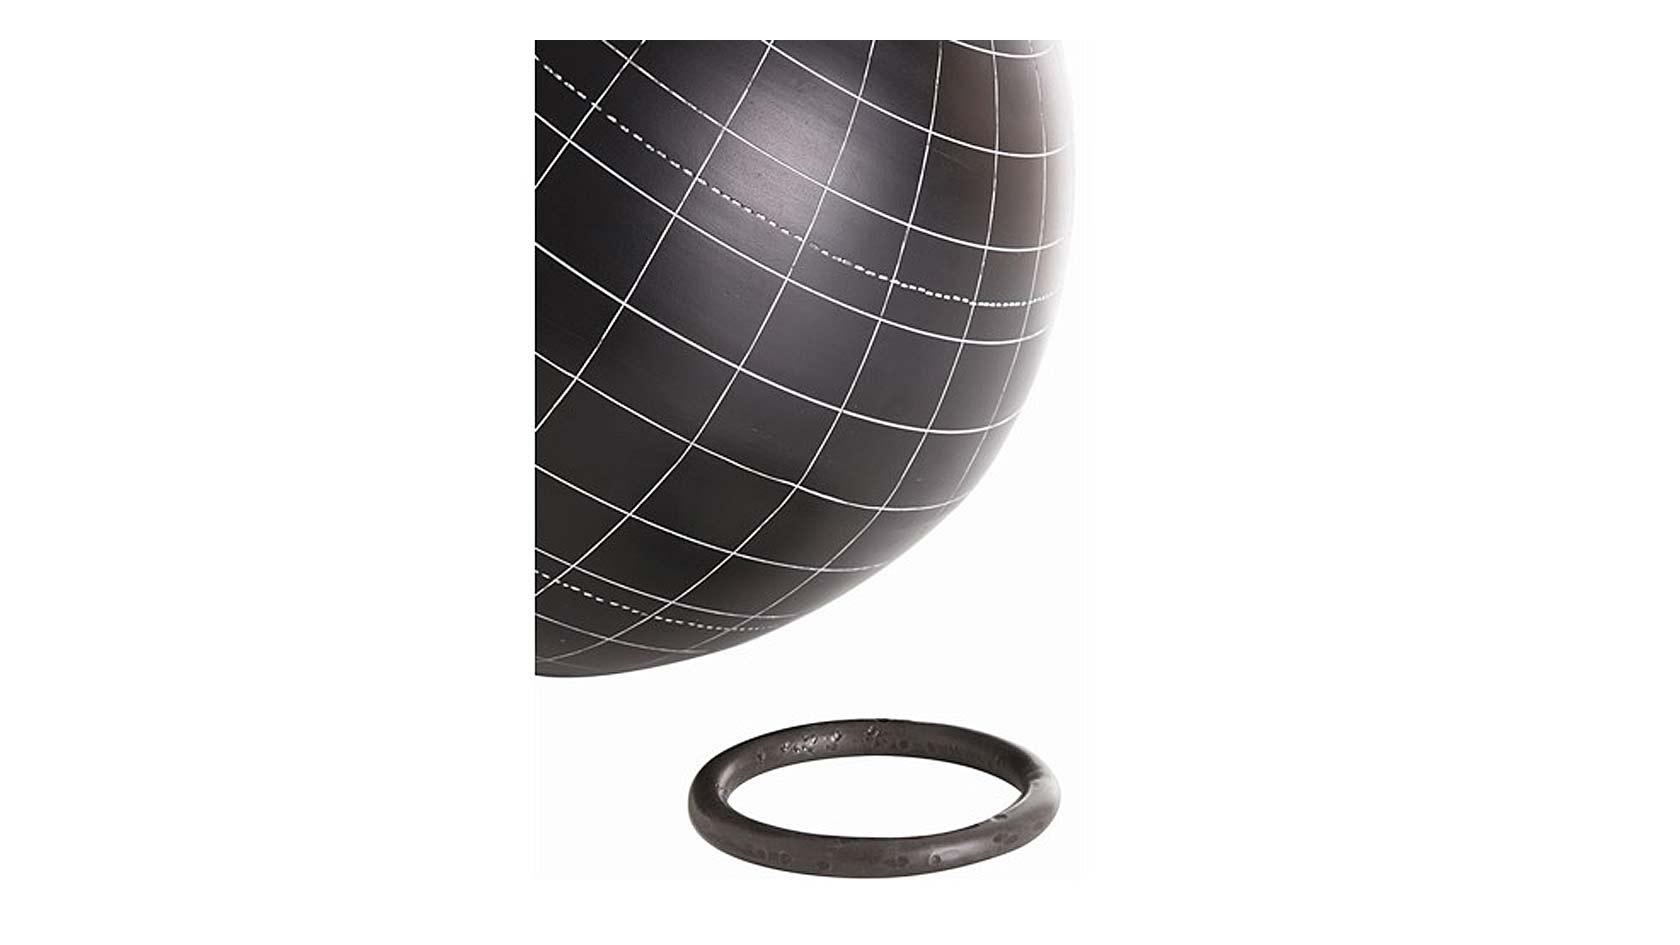 Copernicus Ebony Table Globe